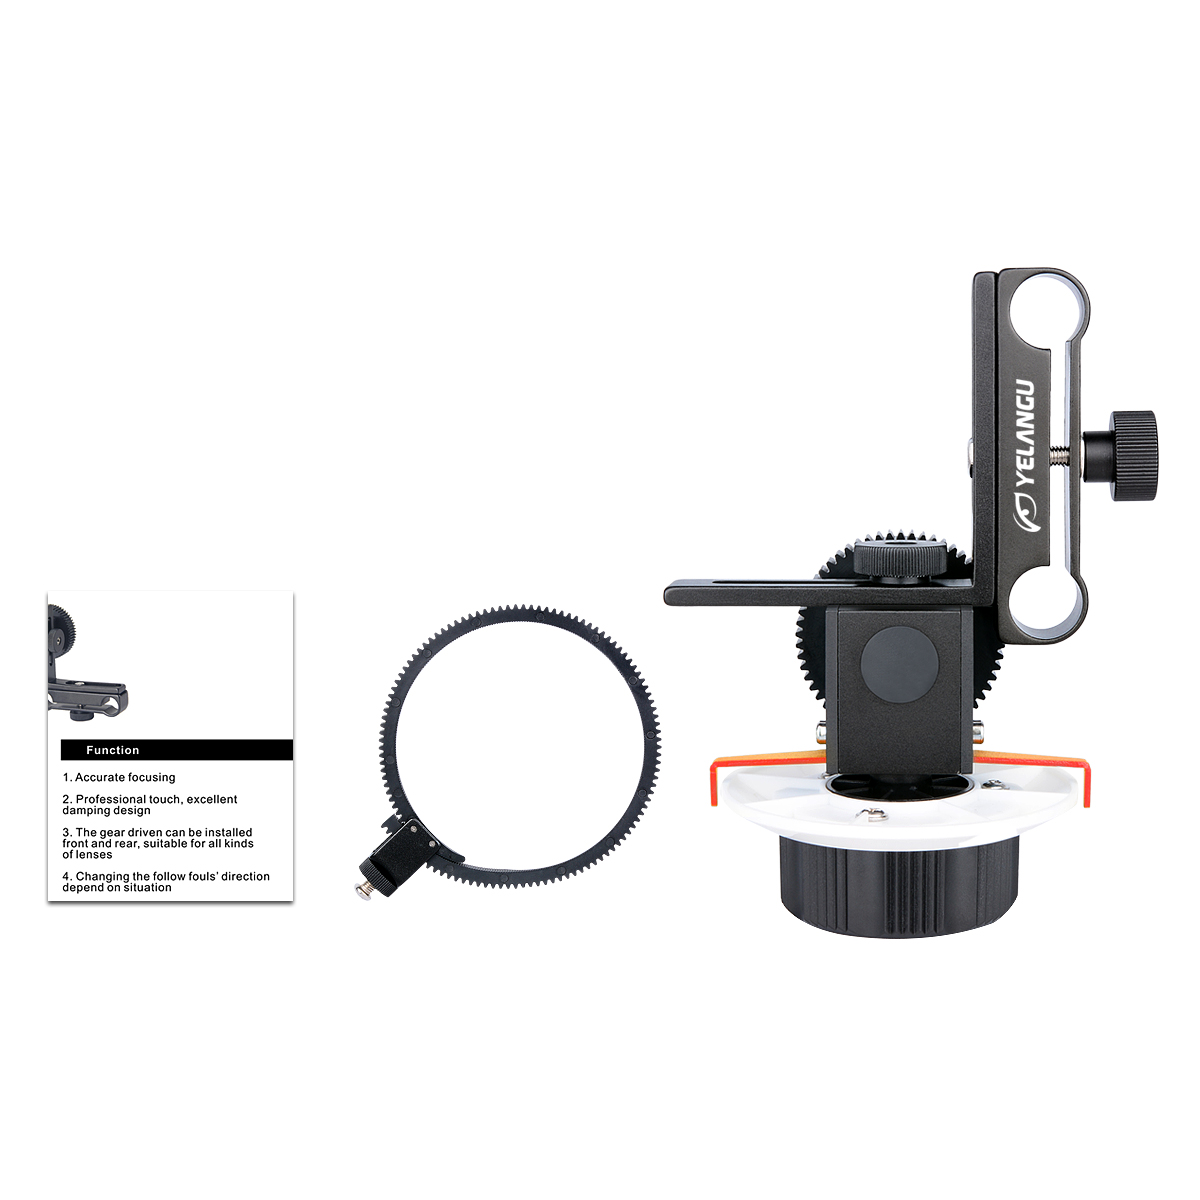 DSLR Camera Follow Focus Quick Fixed Photography Focalizer Precise Adjust Gear for Canon EOS60D 600D SLR Digital Cameras orange